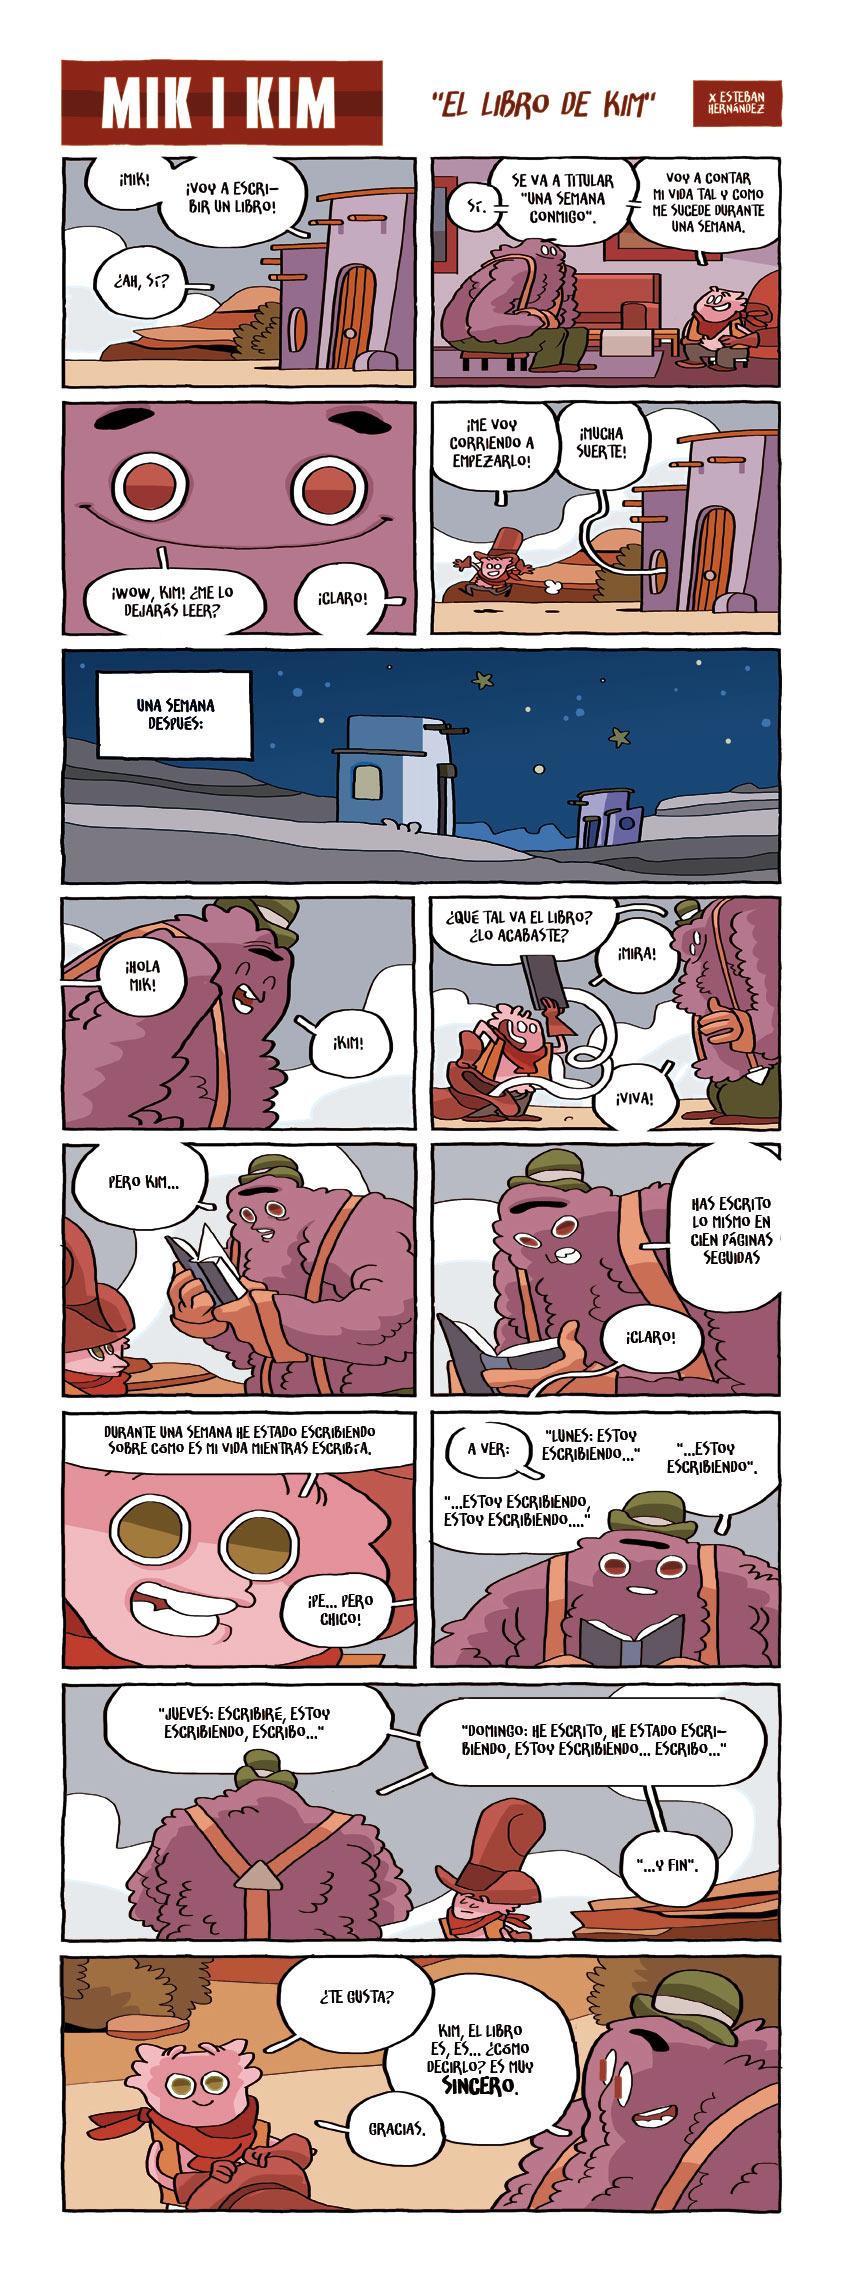 015 · El libro de Kim - Mik i Kim - webcomic - Esteban Hernandez